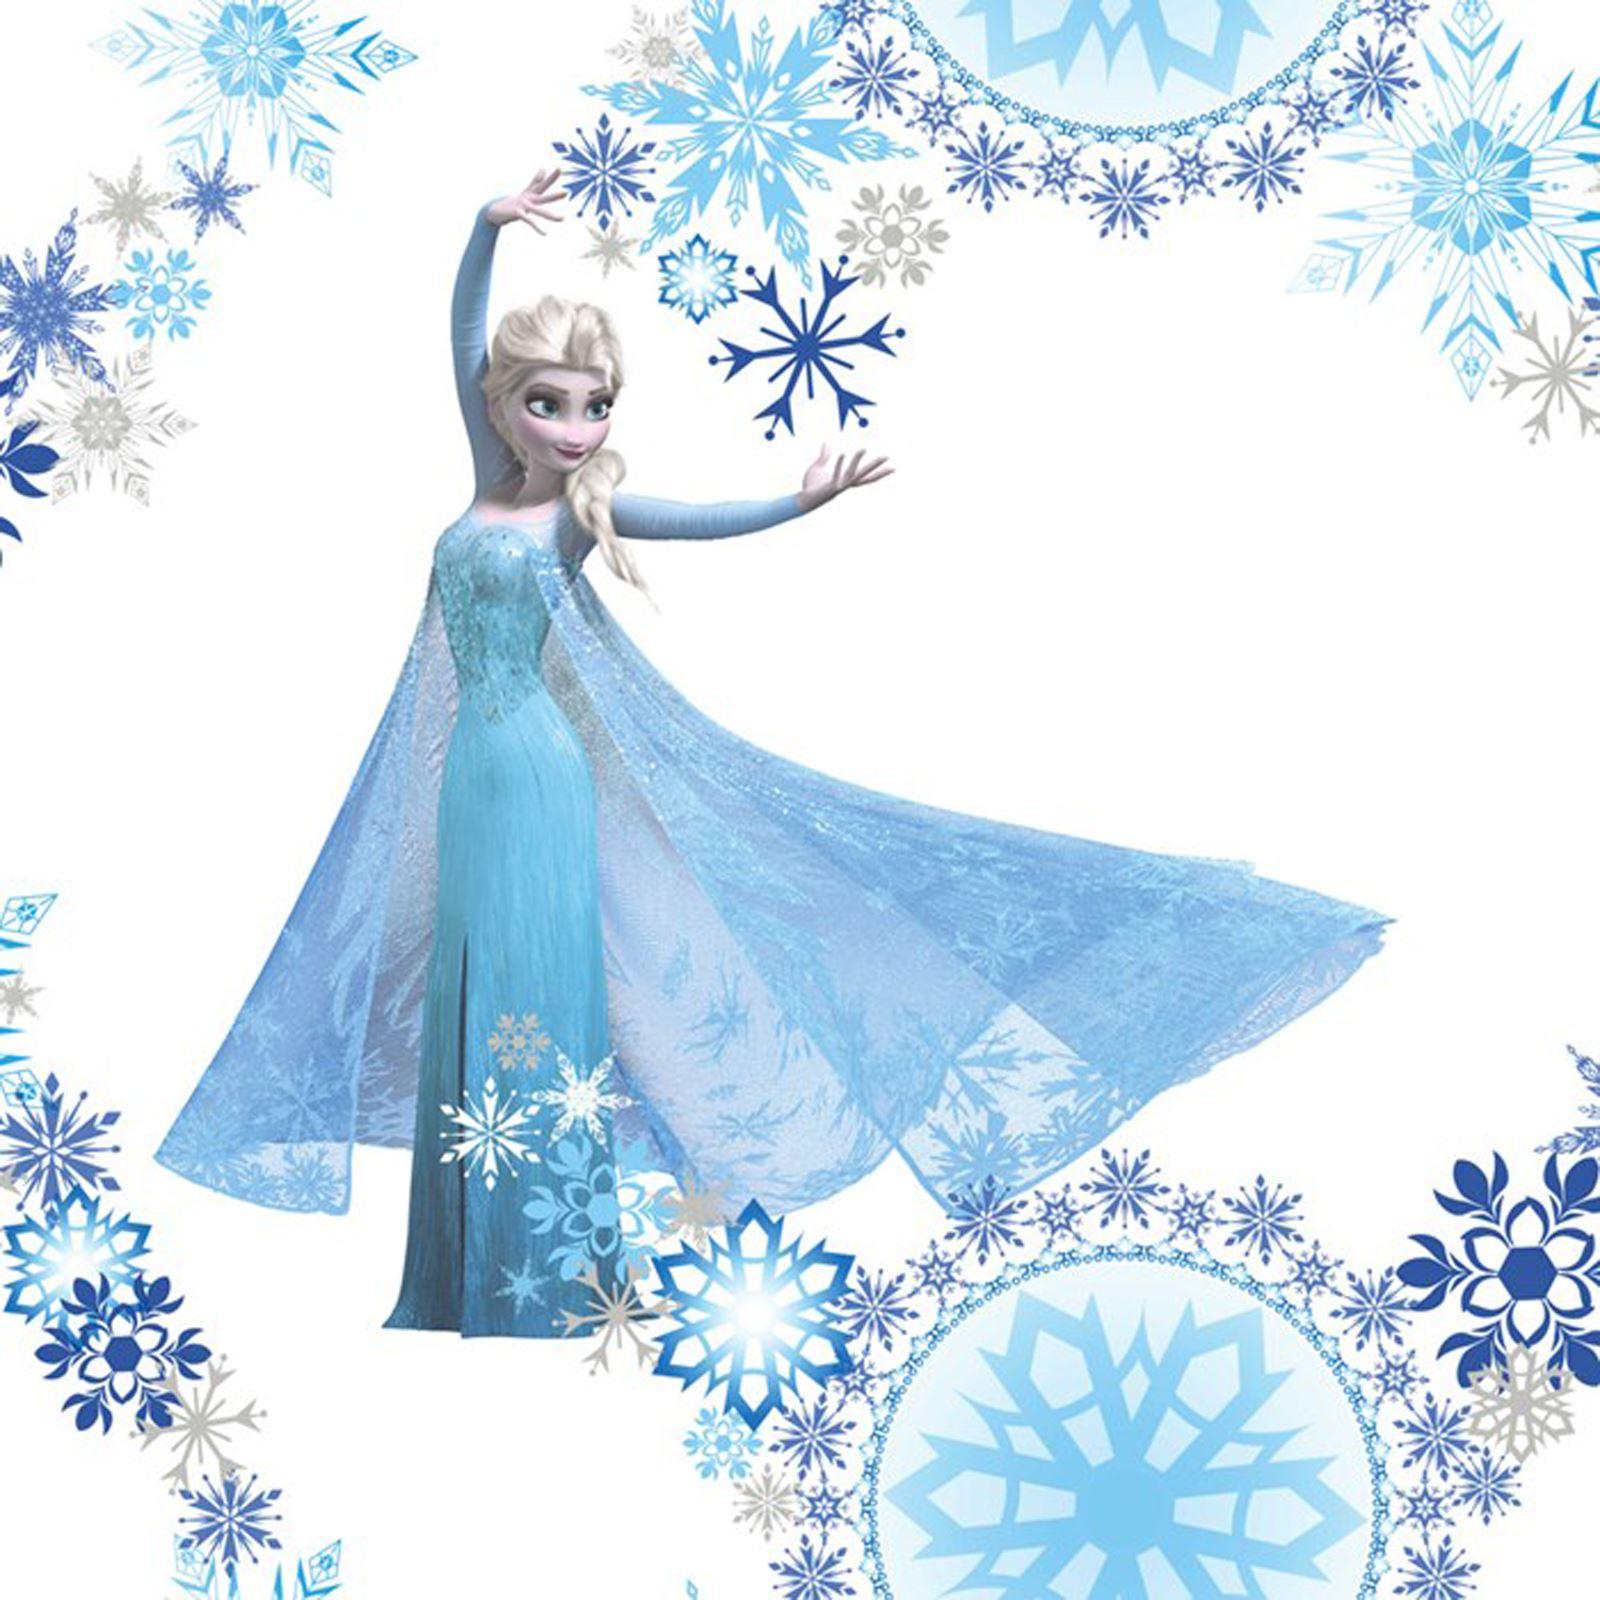 Disney frozen papel pintado cenefas pegatinas nuevo for Papel pintado disney